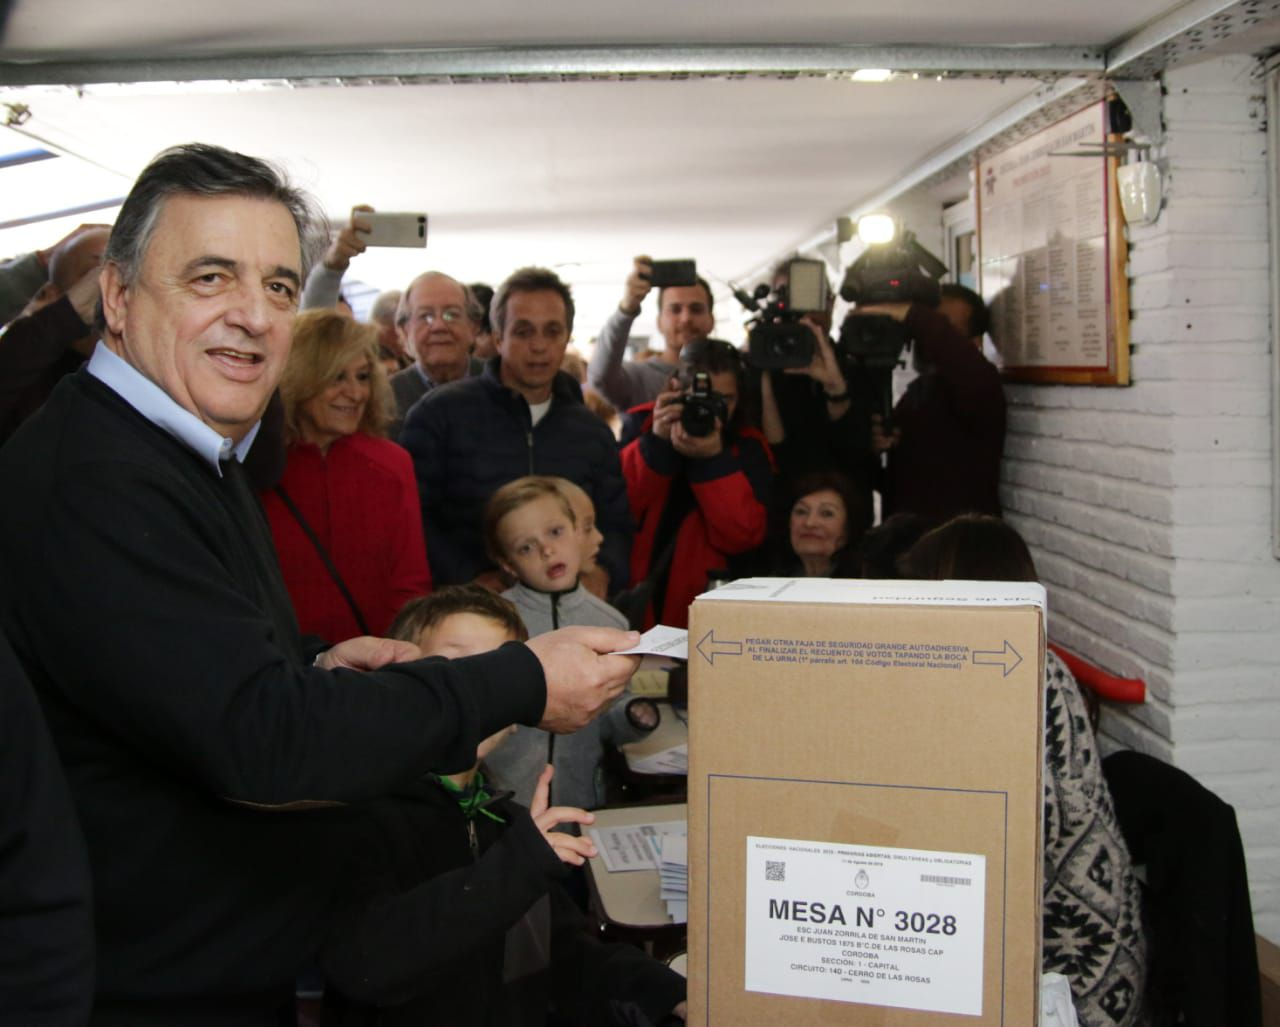 El diputado nacional Mario Negri